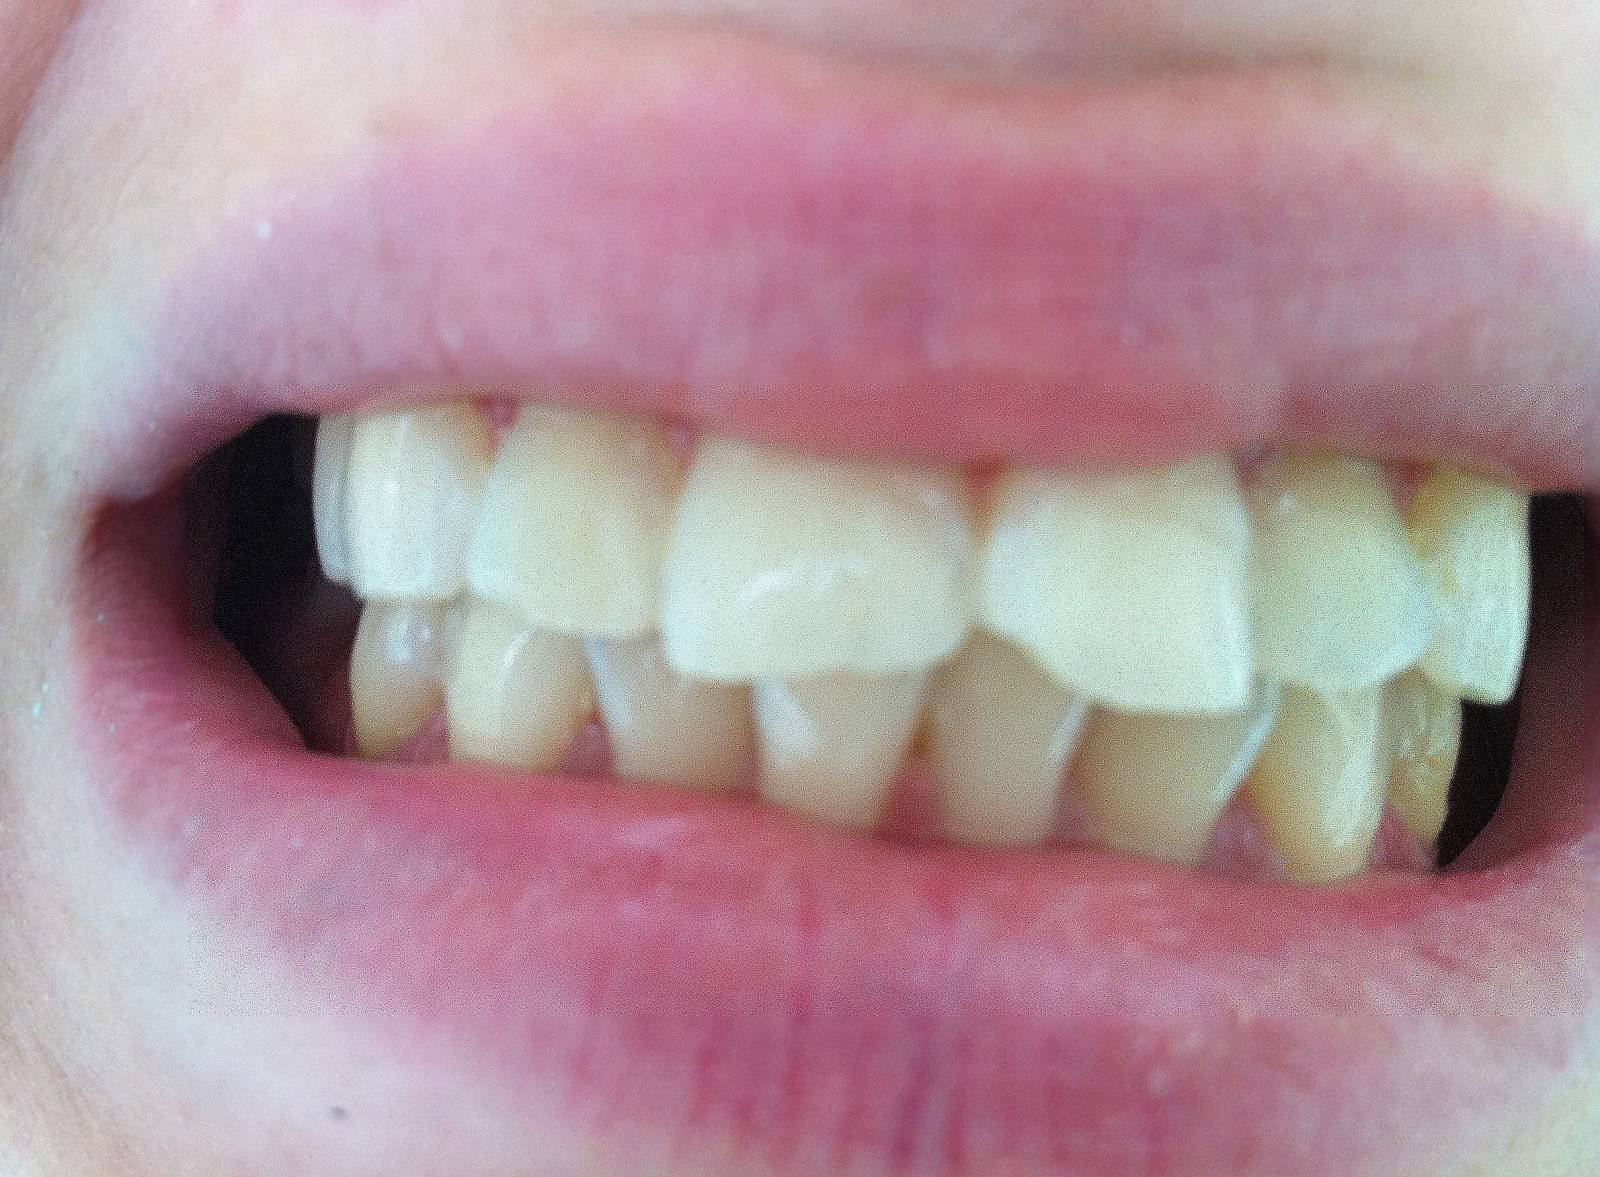 отбеливание зубов zoom 4 клиника